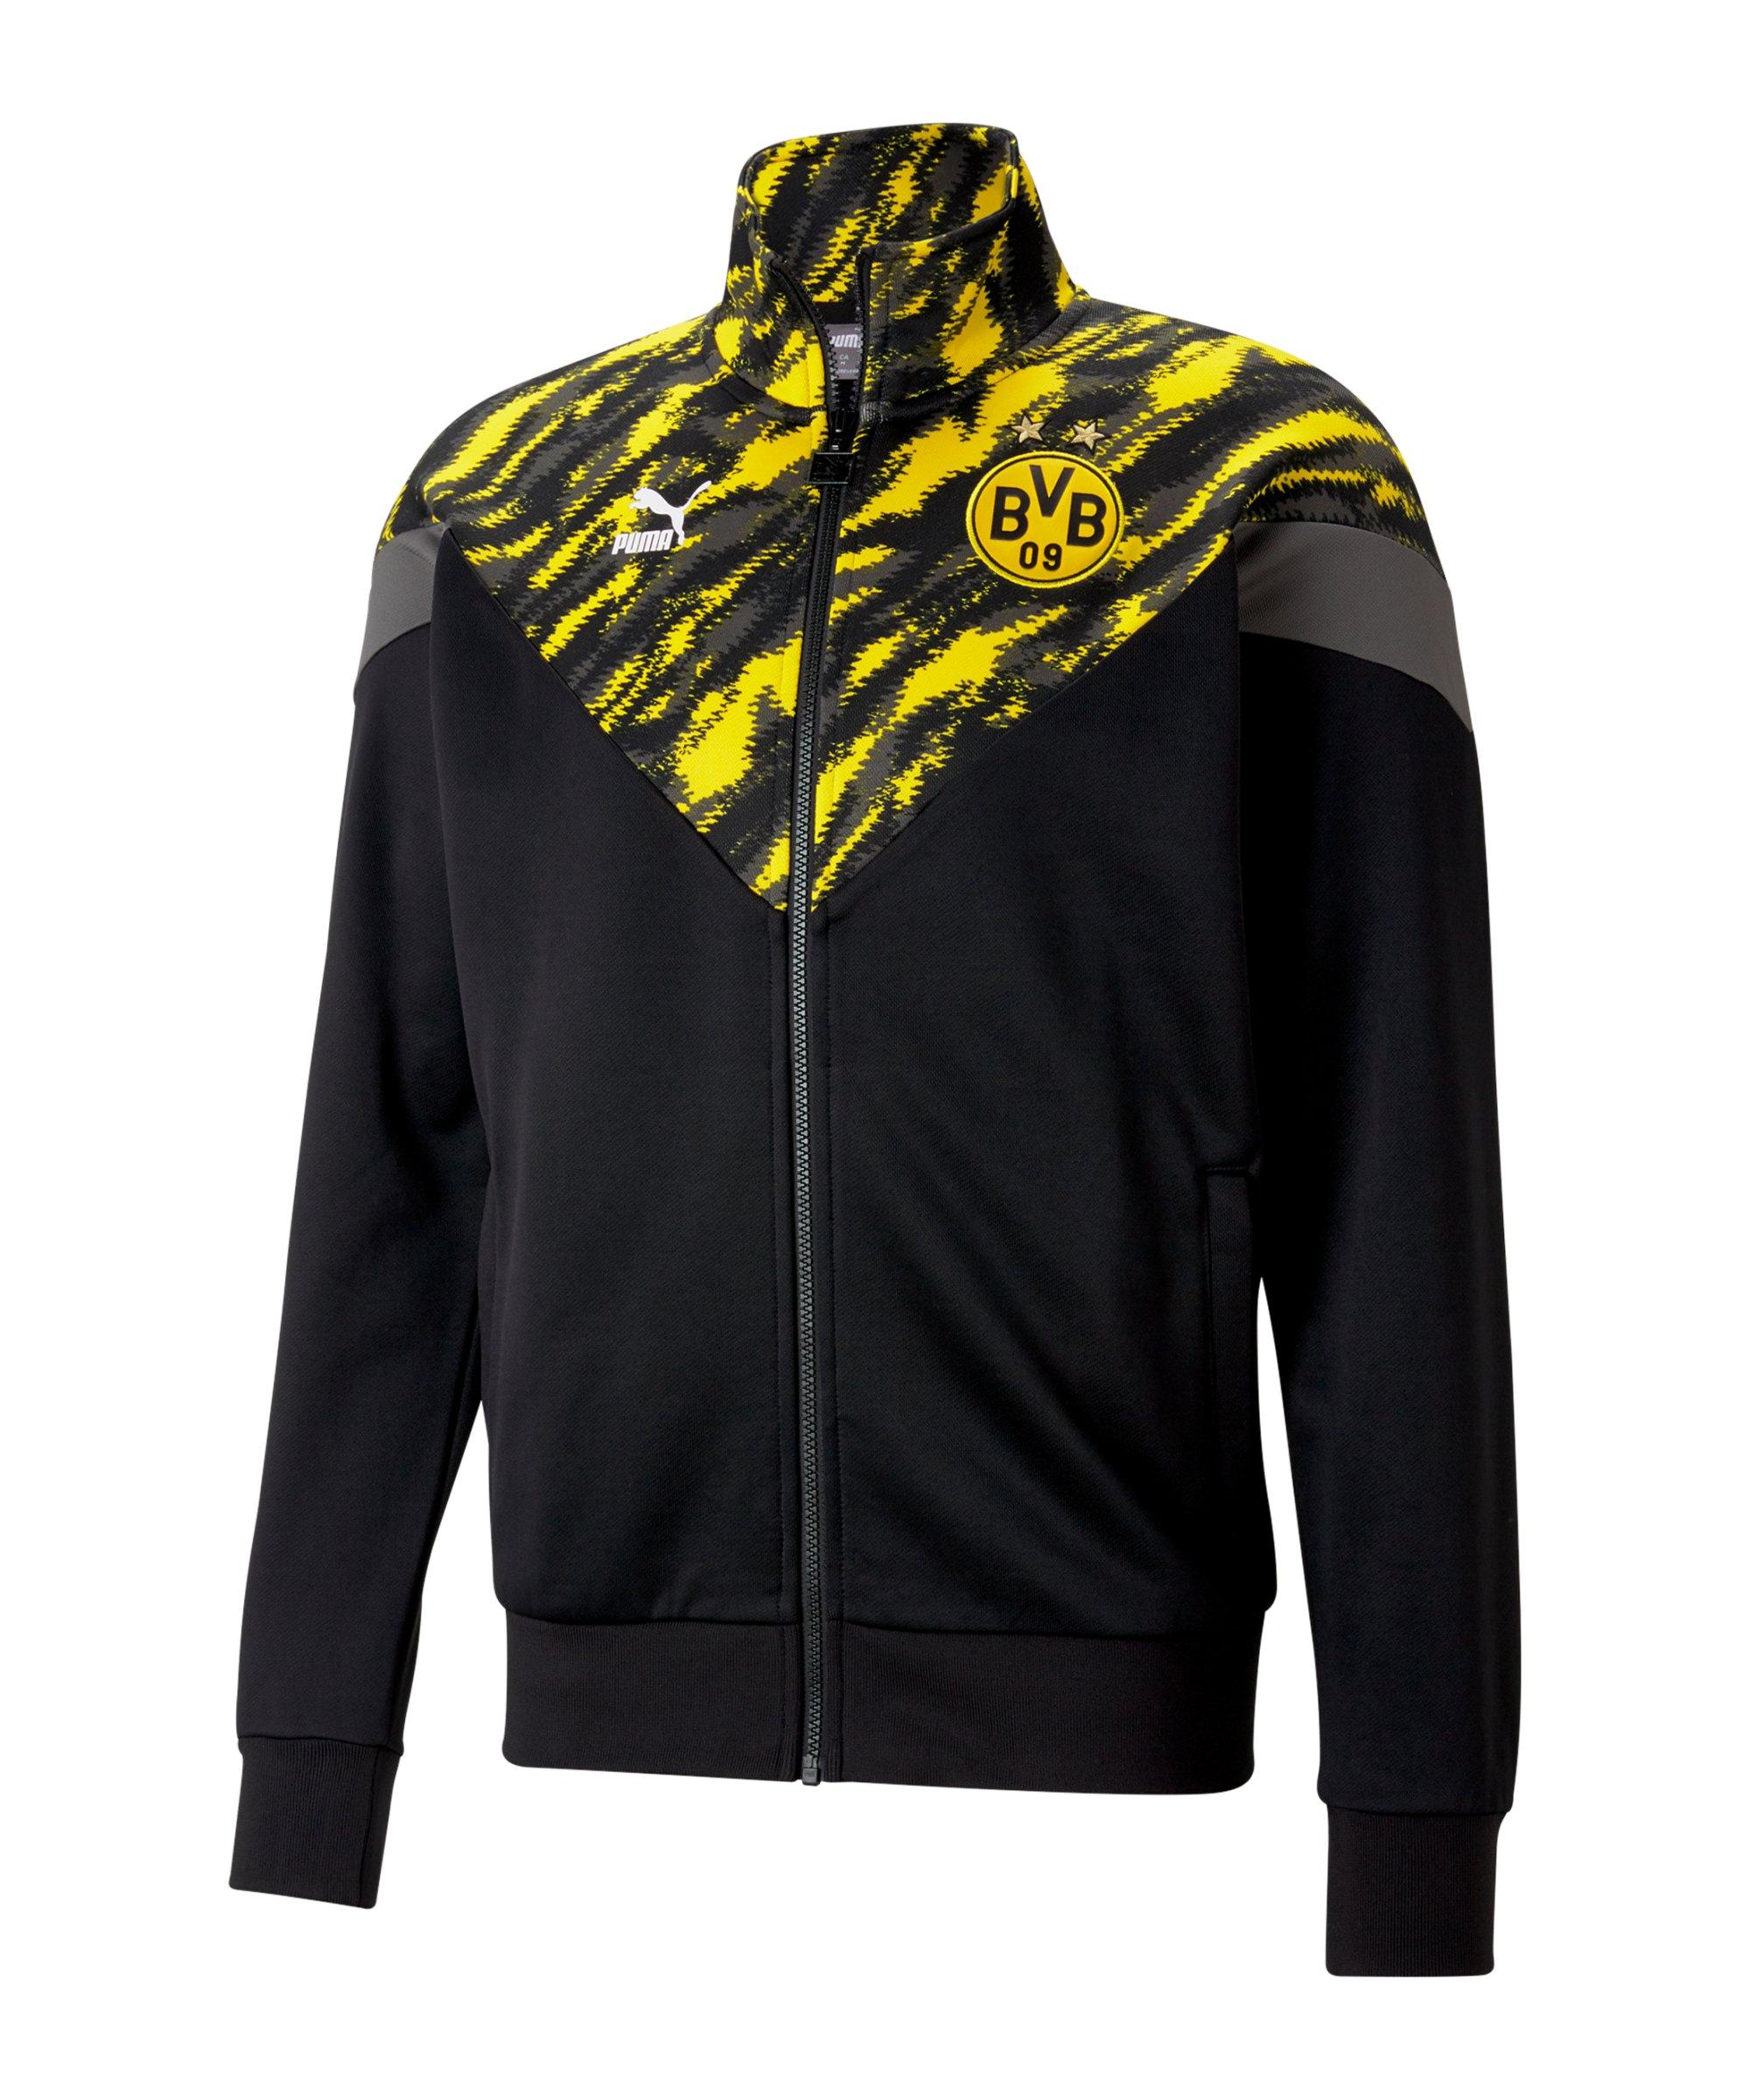 PUMA BVB Dortmund Iconic Graphic Track Jacke F01 - schwarz